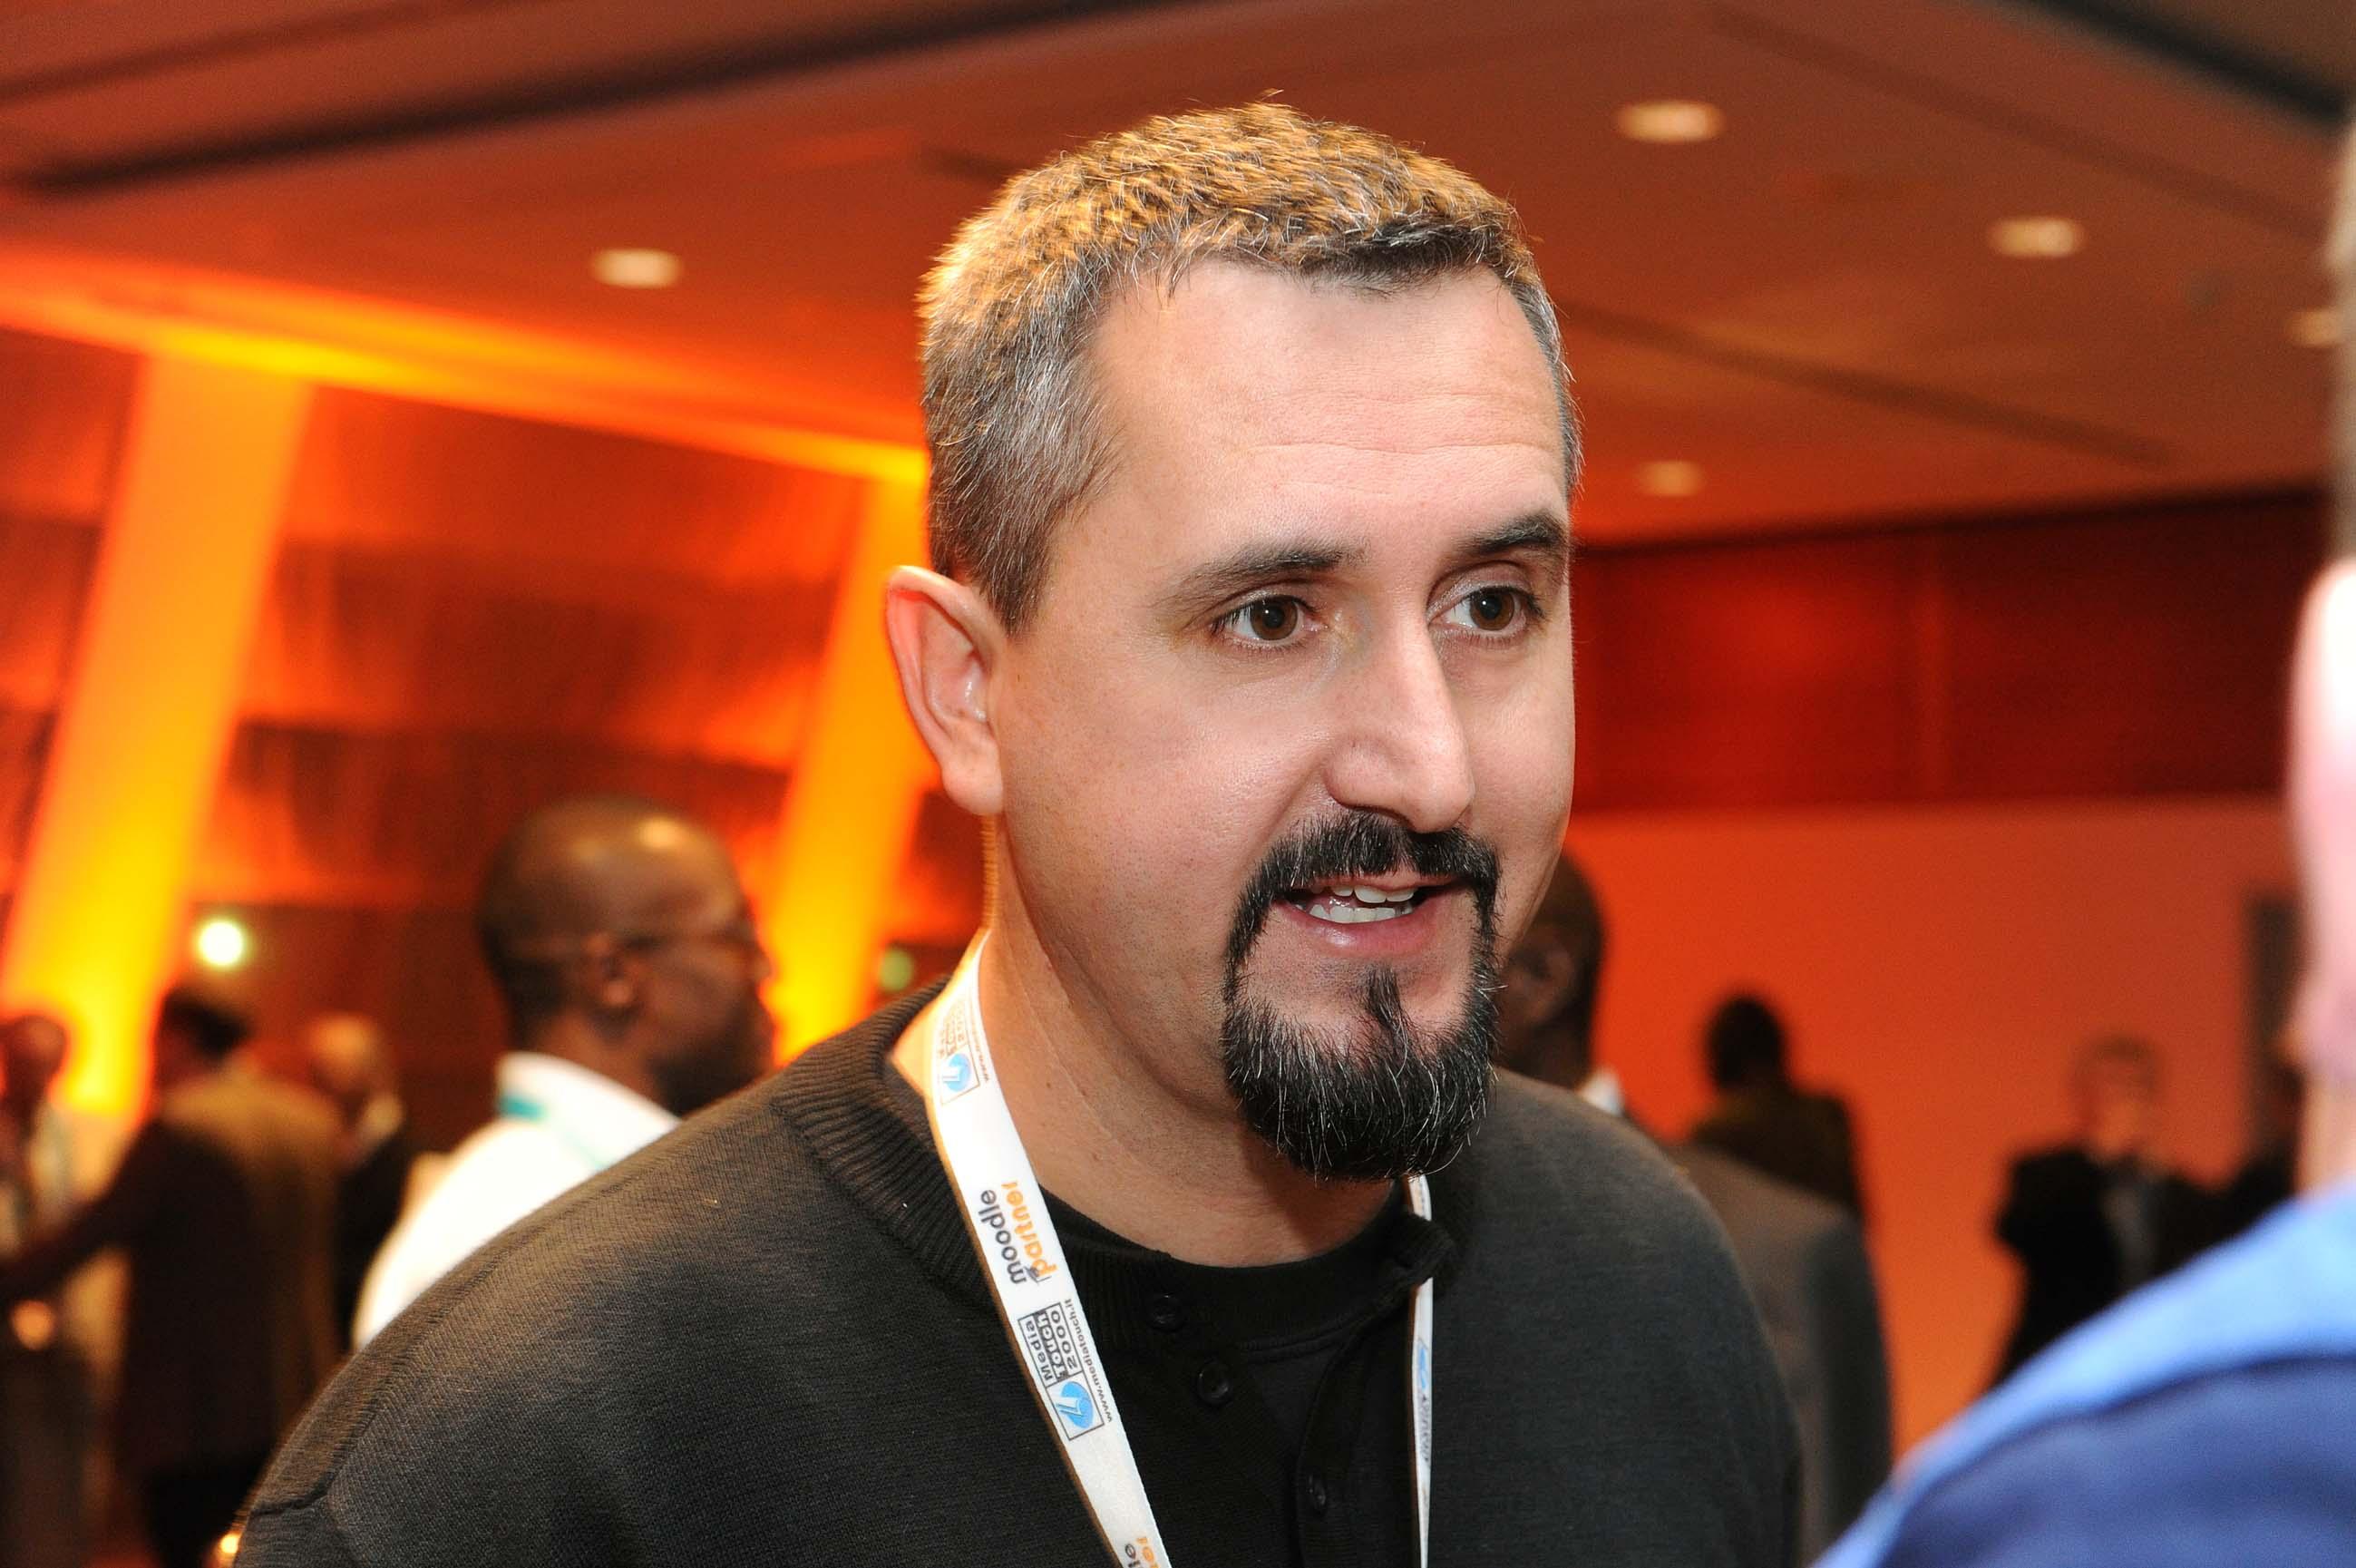 Martin Dougiamas spoke about Moodle 2.0 at the 2009 Online Educa in Berlin